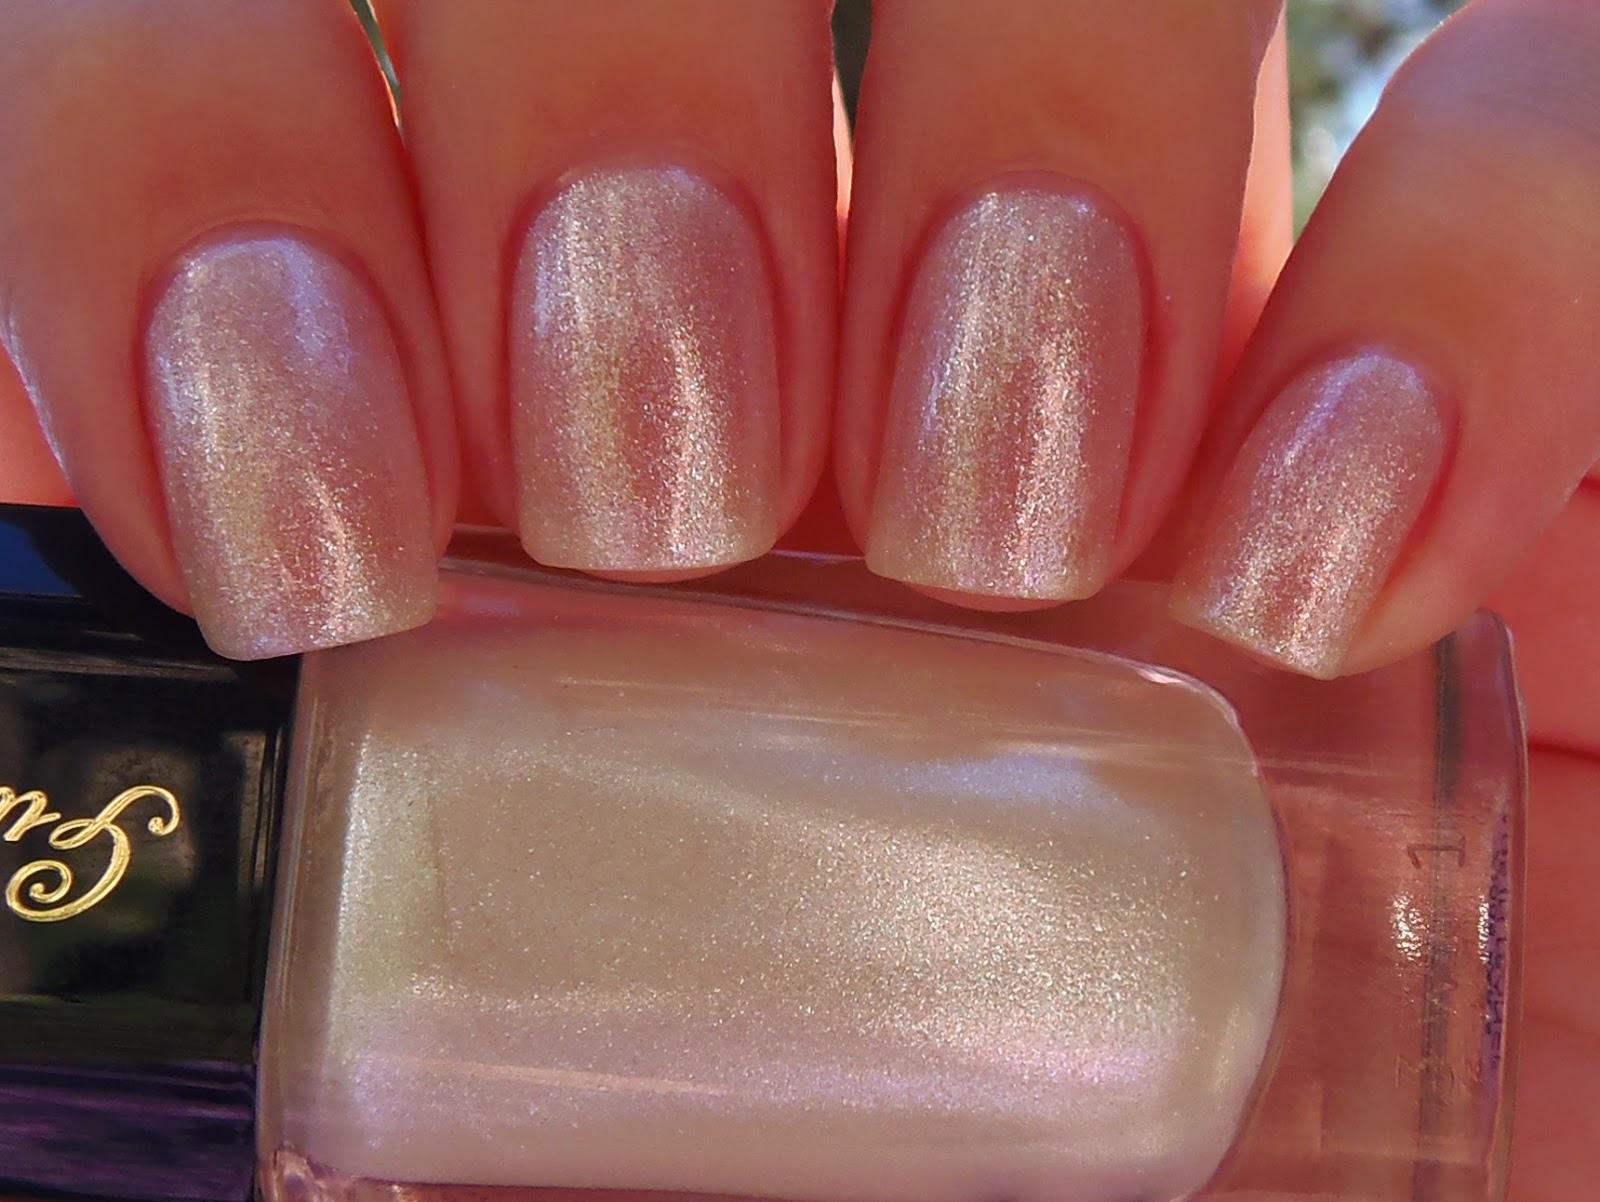 Star dust nail lacquer guerlain 25 - 2 Coats Guerlain Star Dust 862 Dior Gel Coat